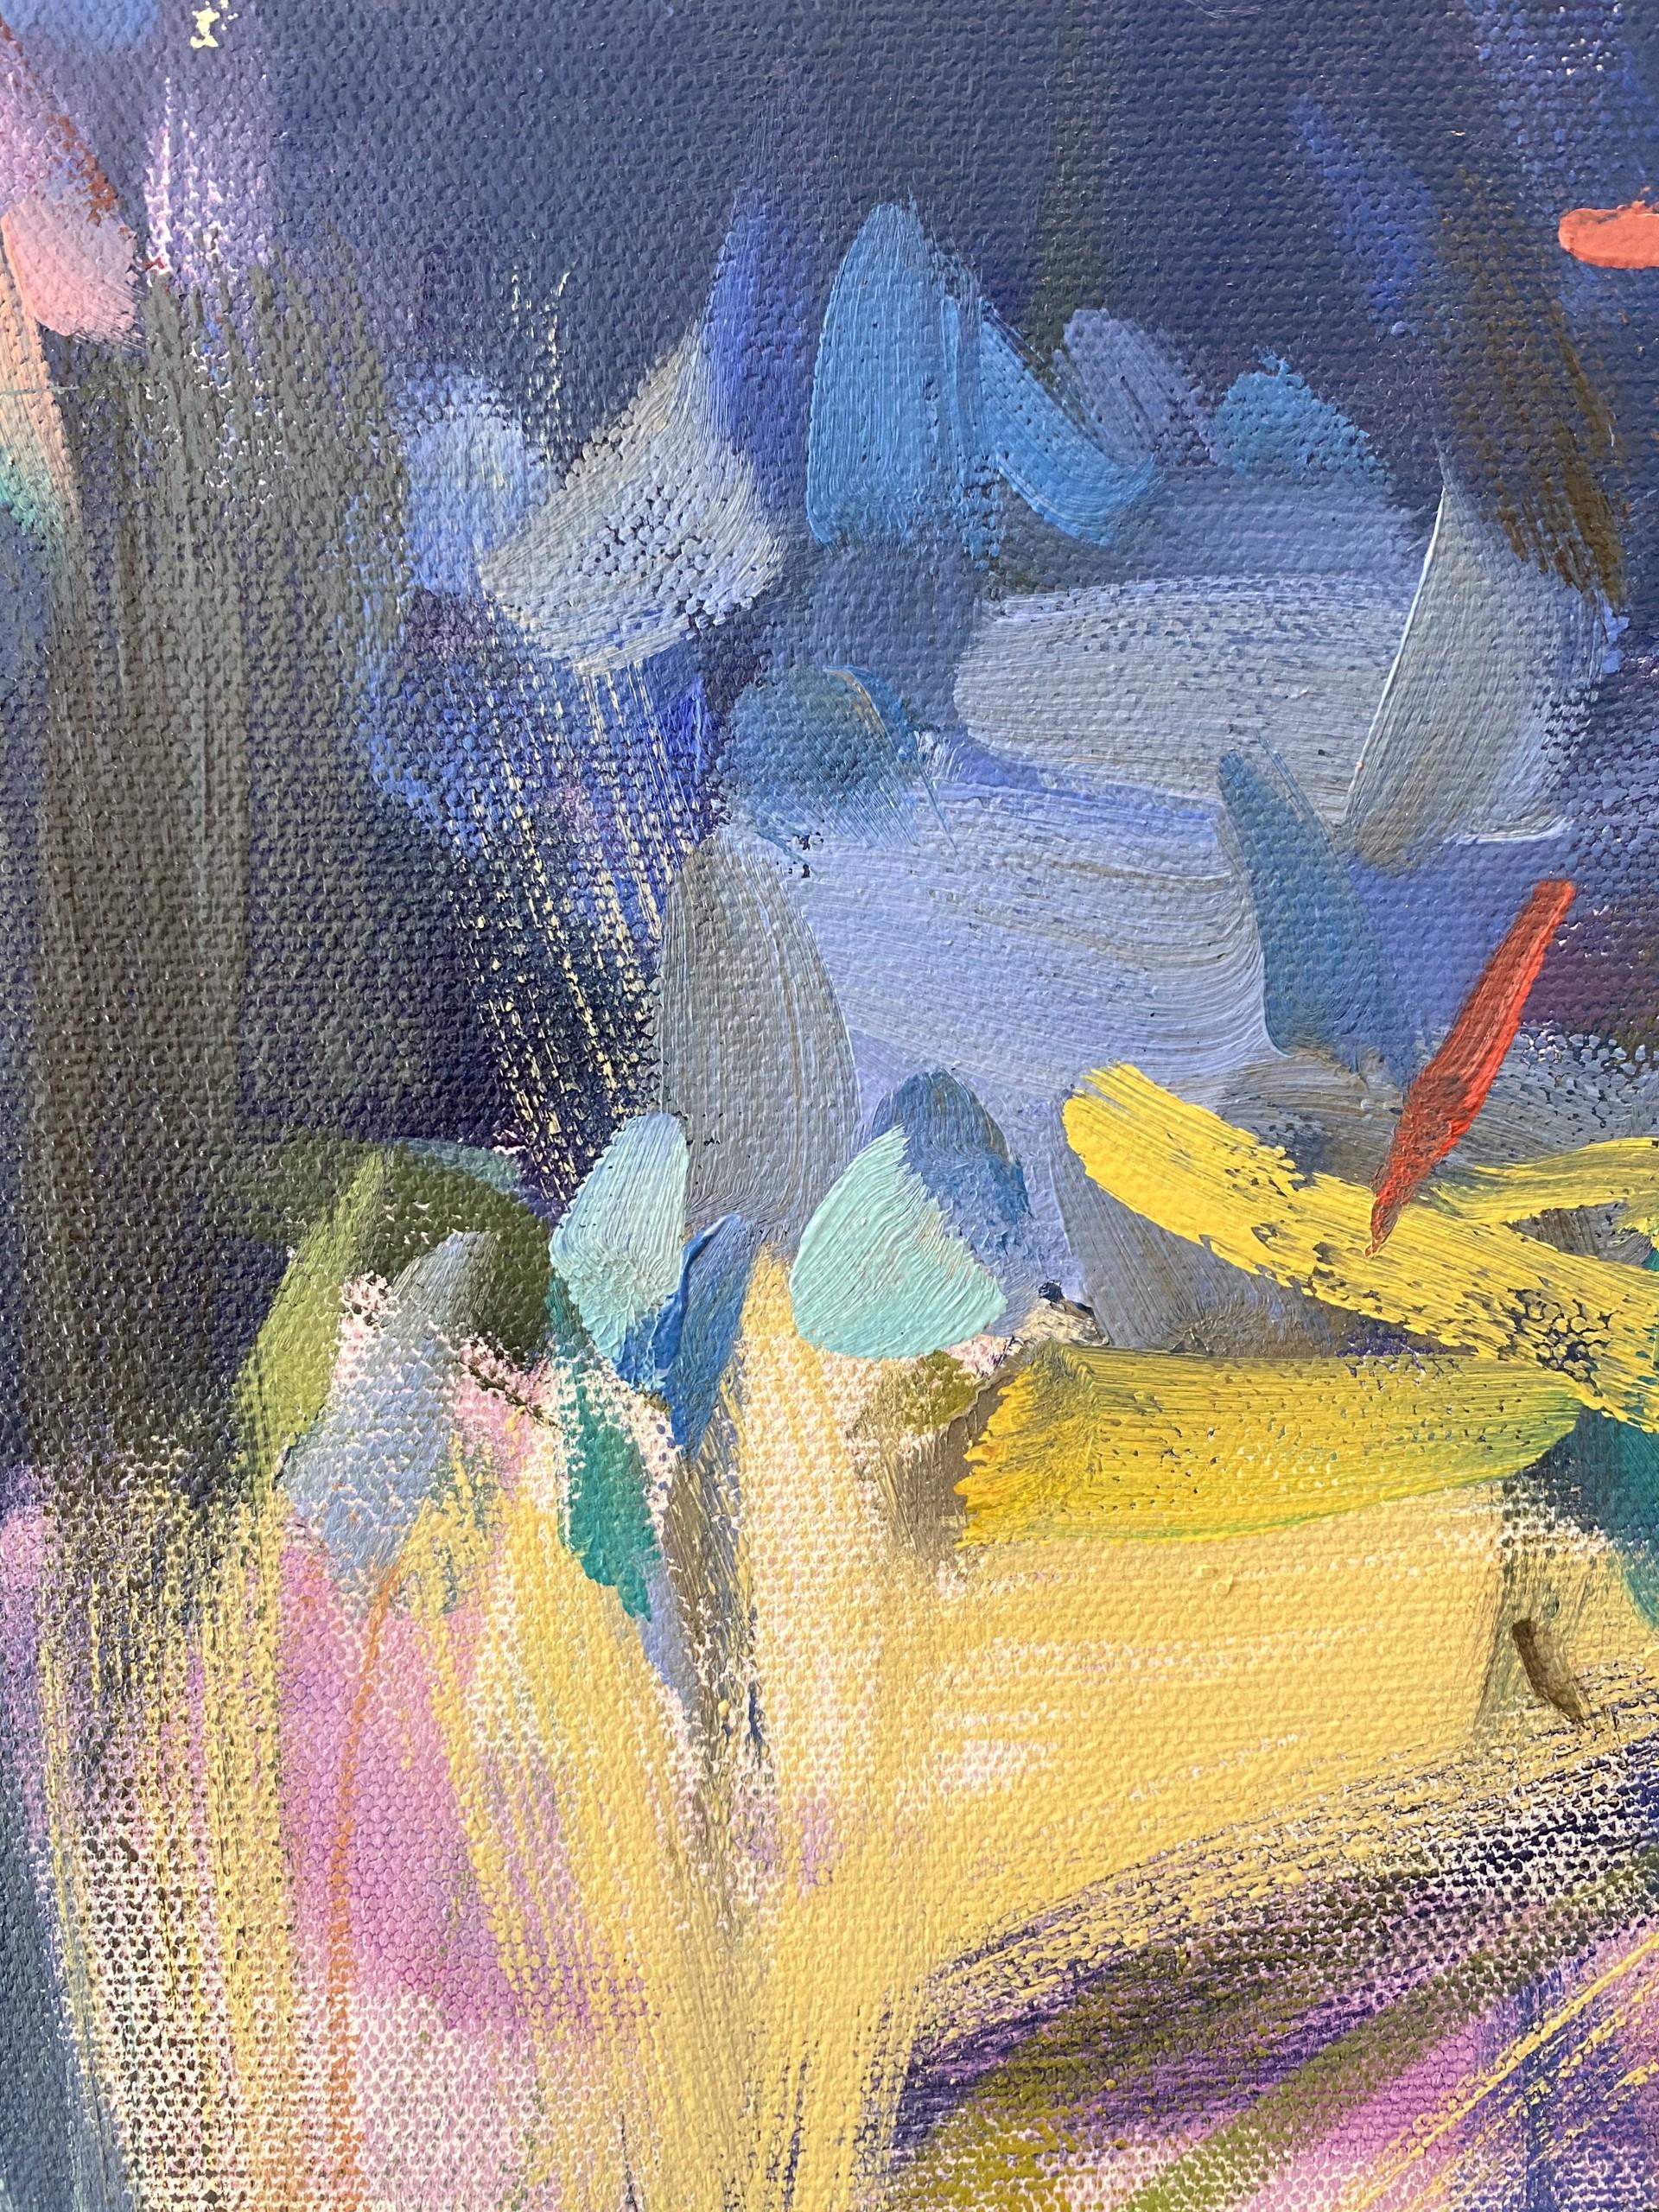 Petal Confetti, III by Marissa Vogl